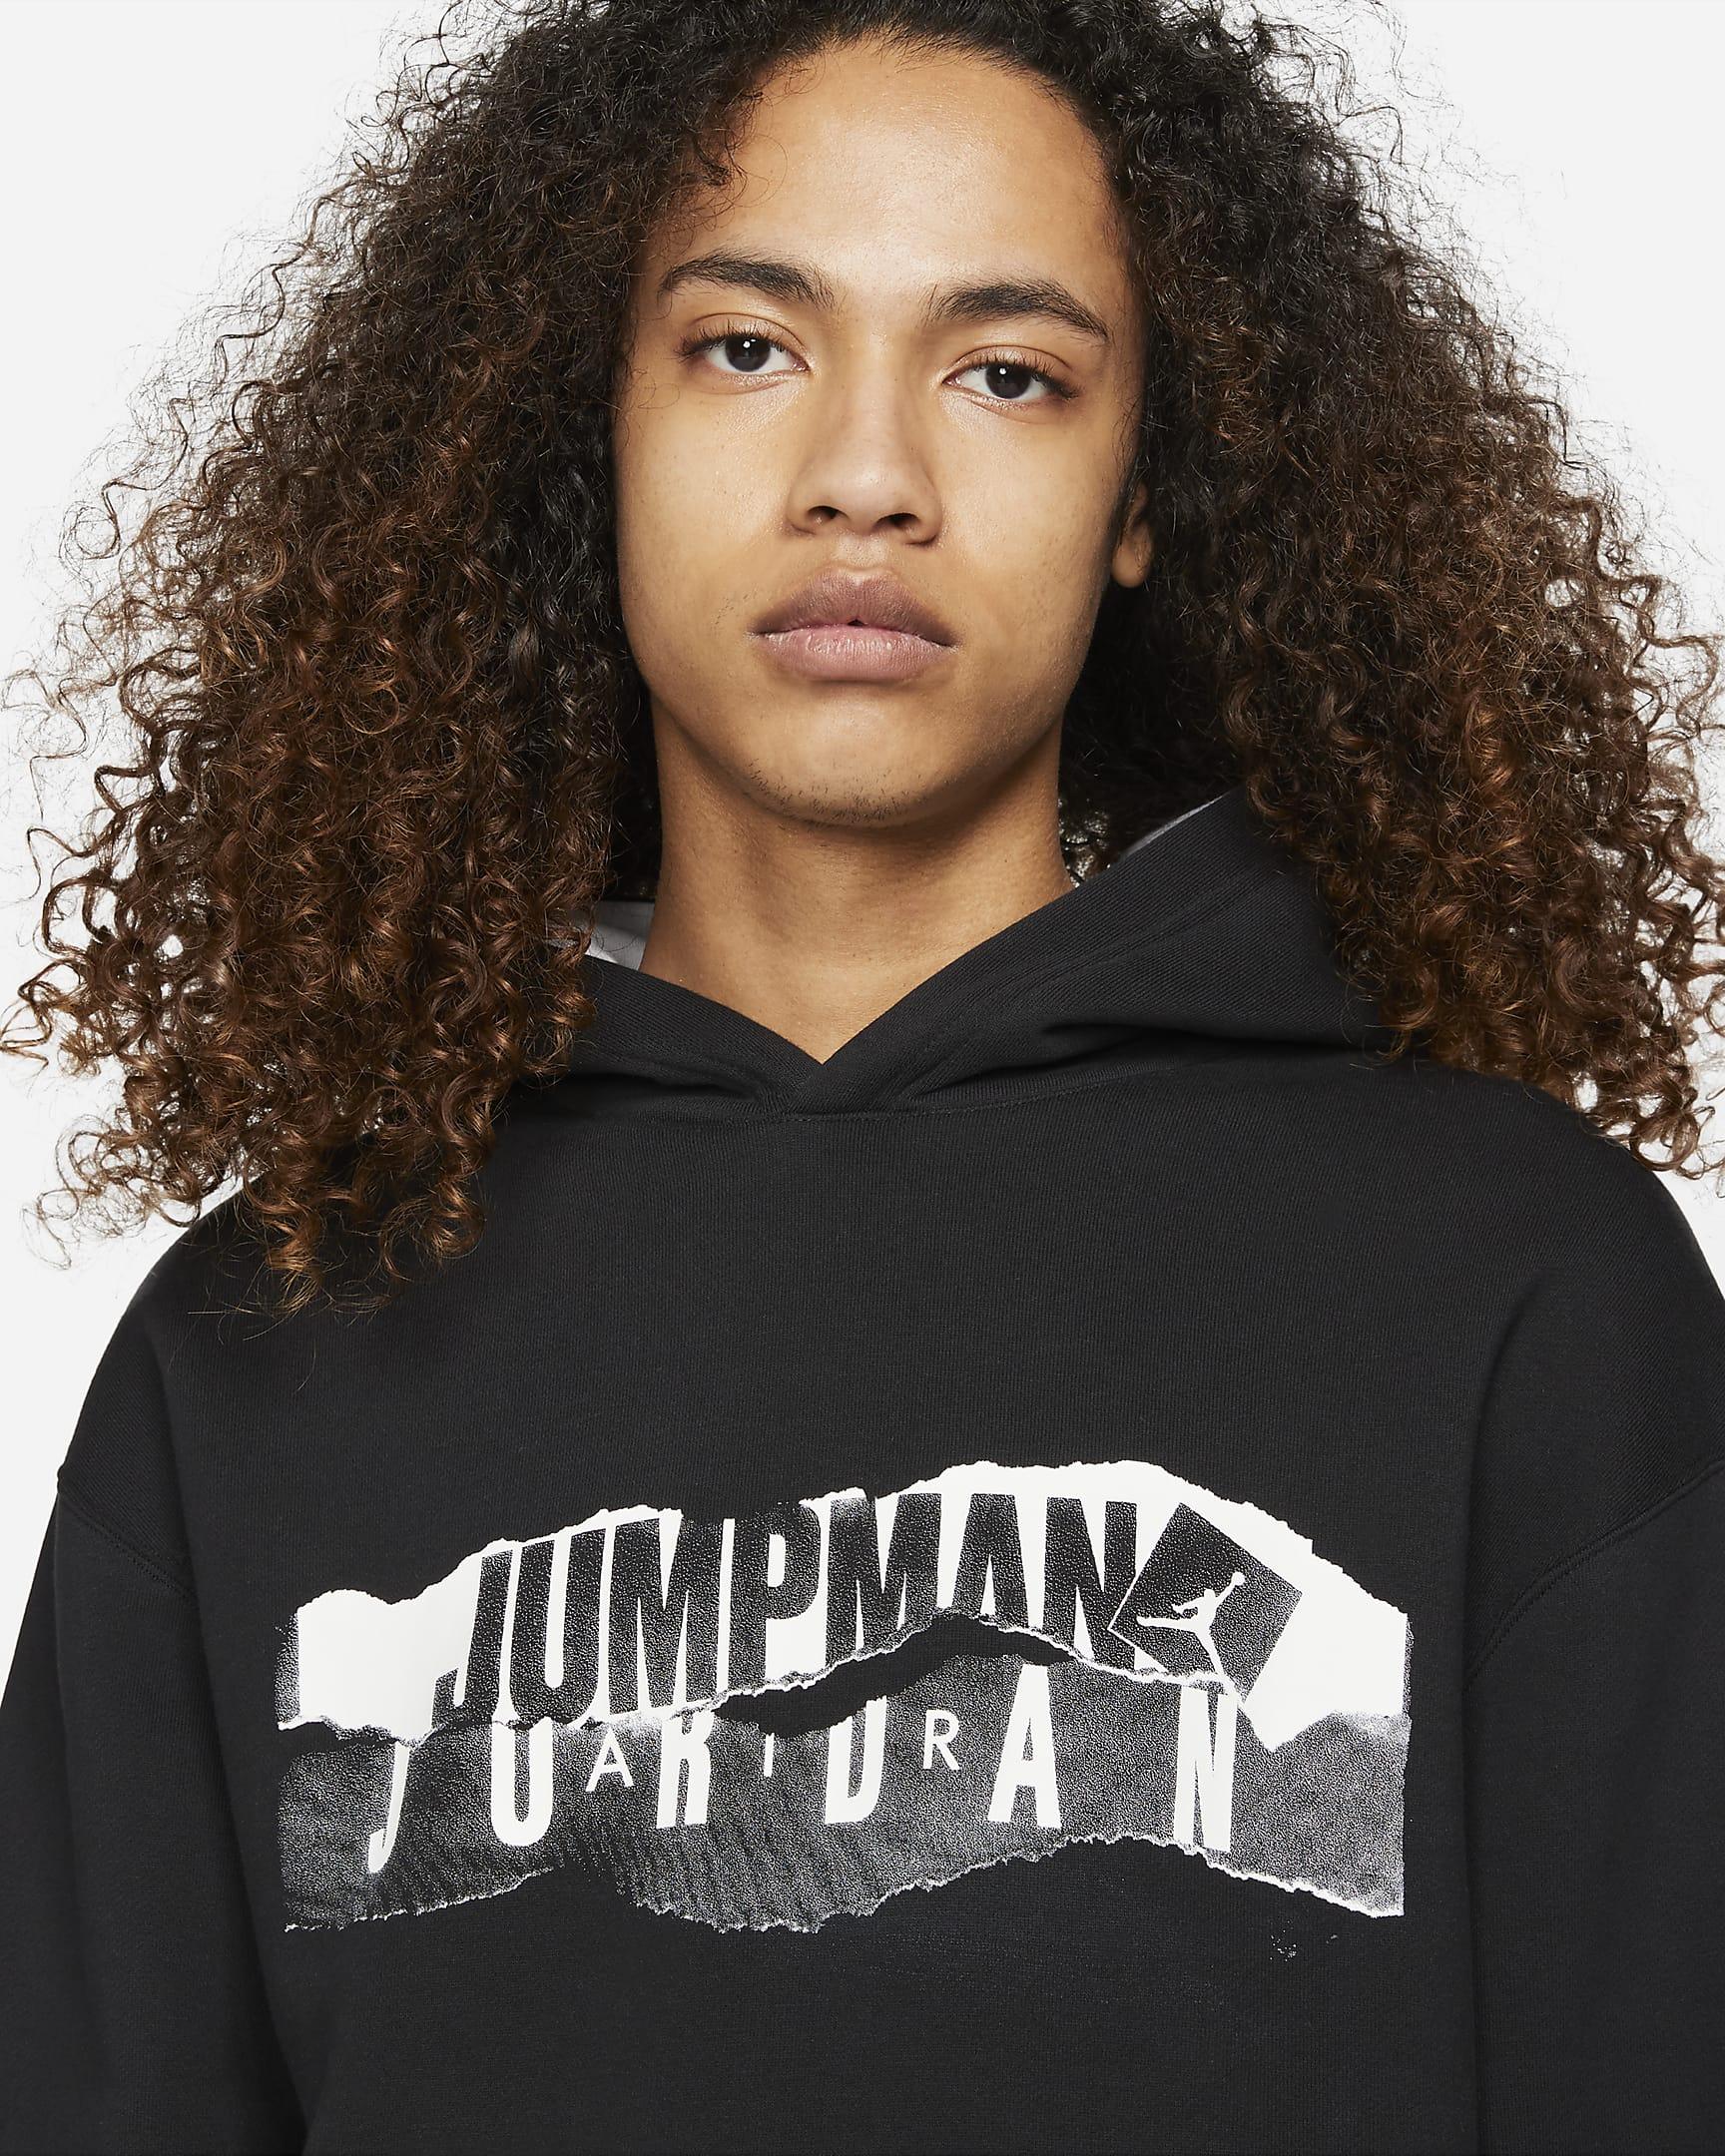 jordan-essential-mens-fleece-graphic-hoodie-L4wV9m-2.png